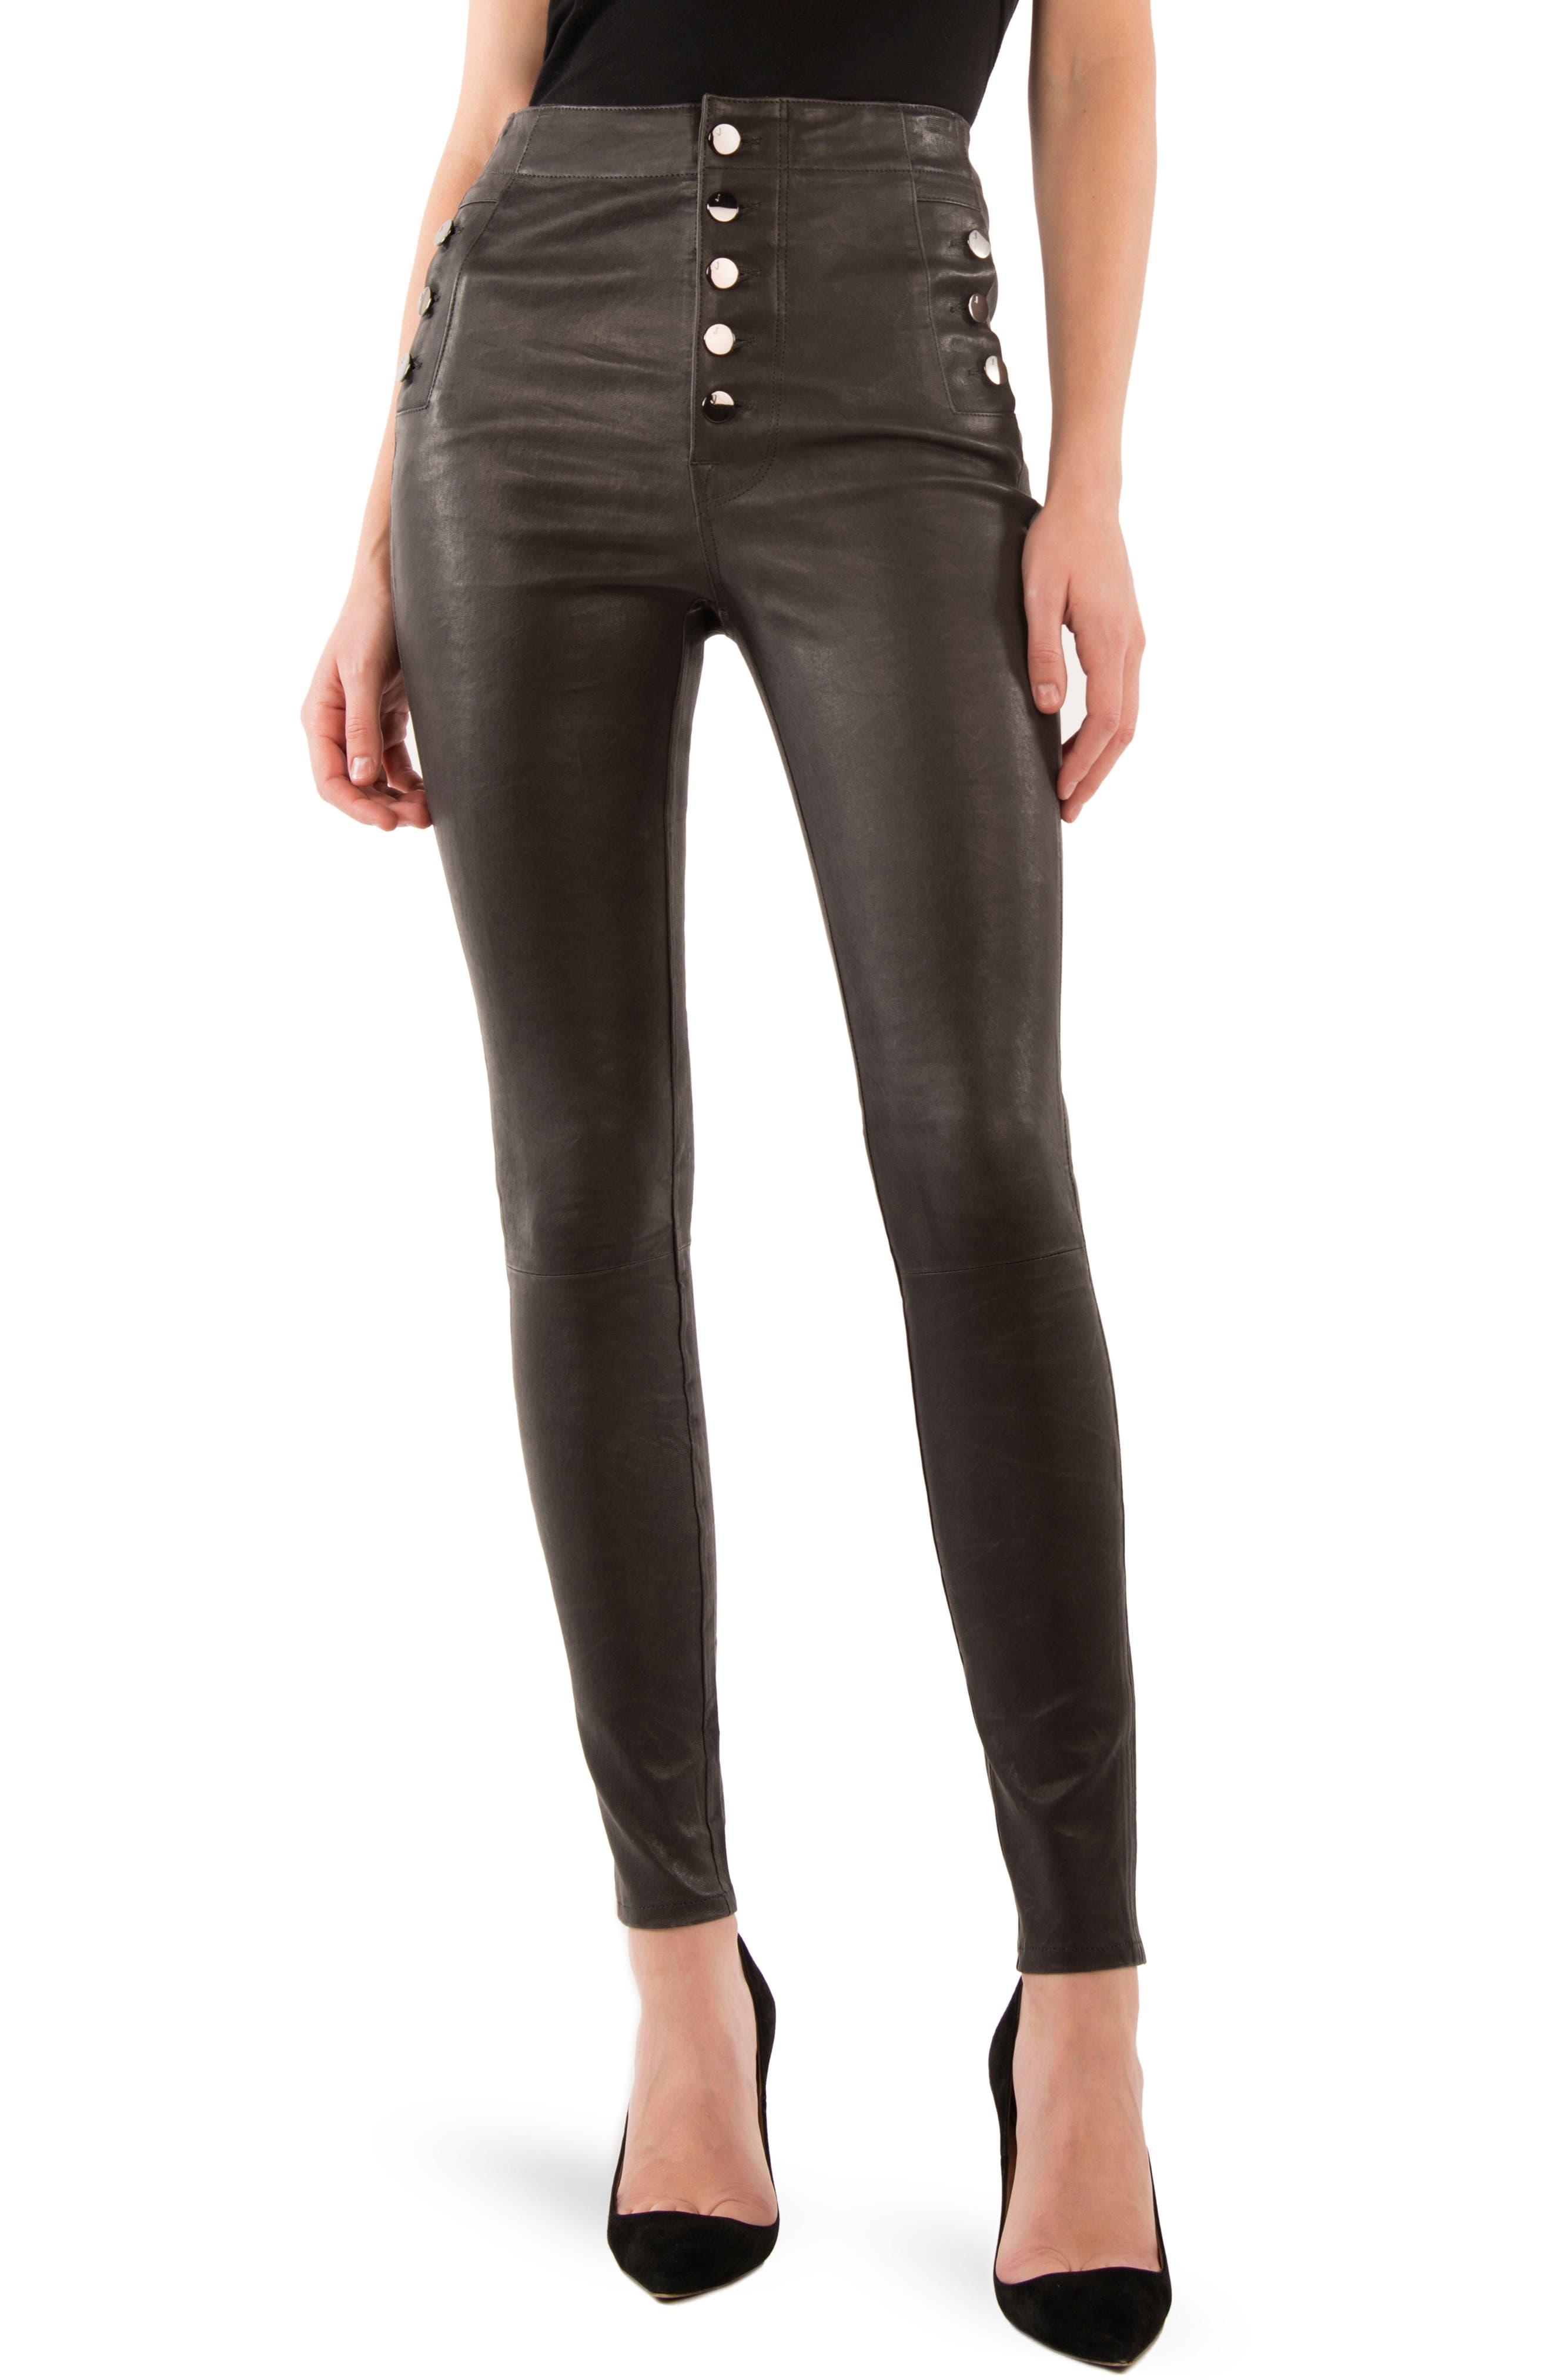 Natasha High Waist Skinny Leather Pants,                         Main,                         color, 039